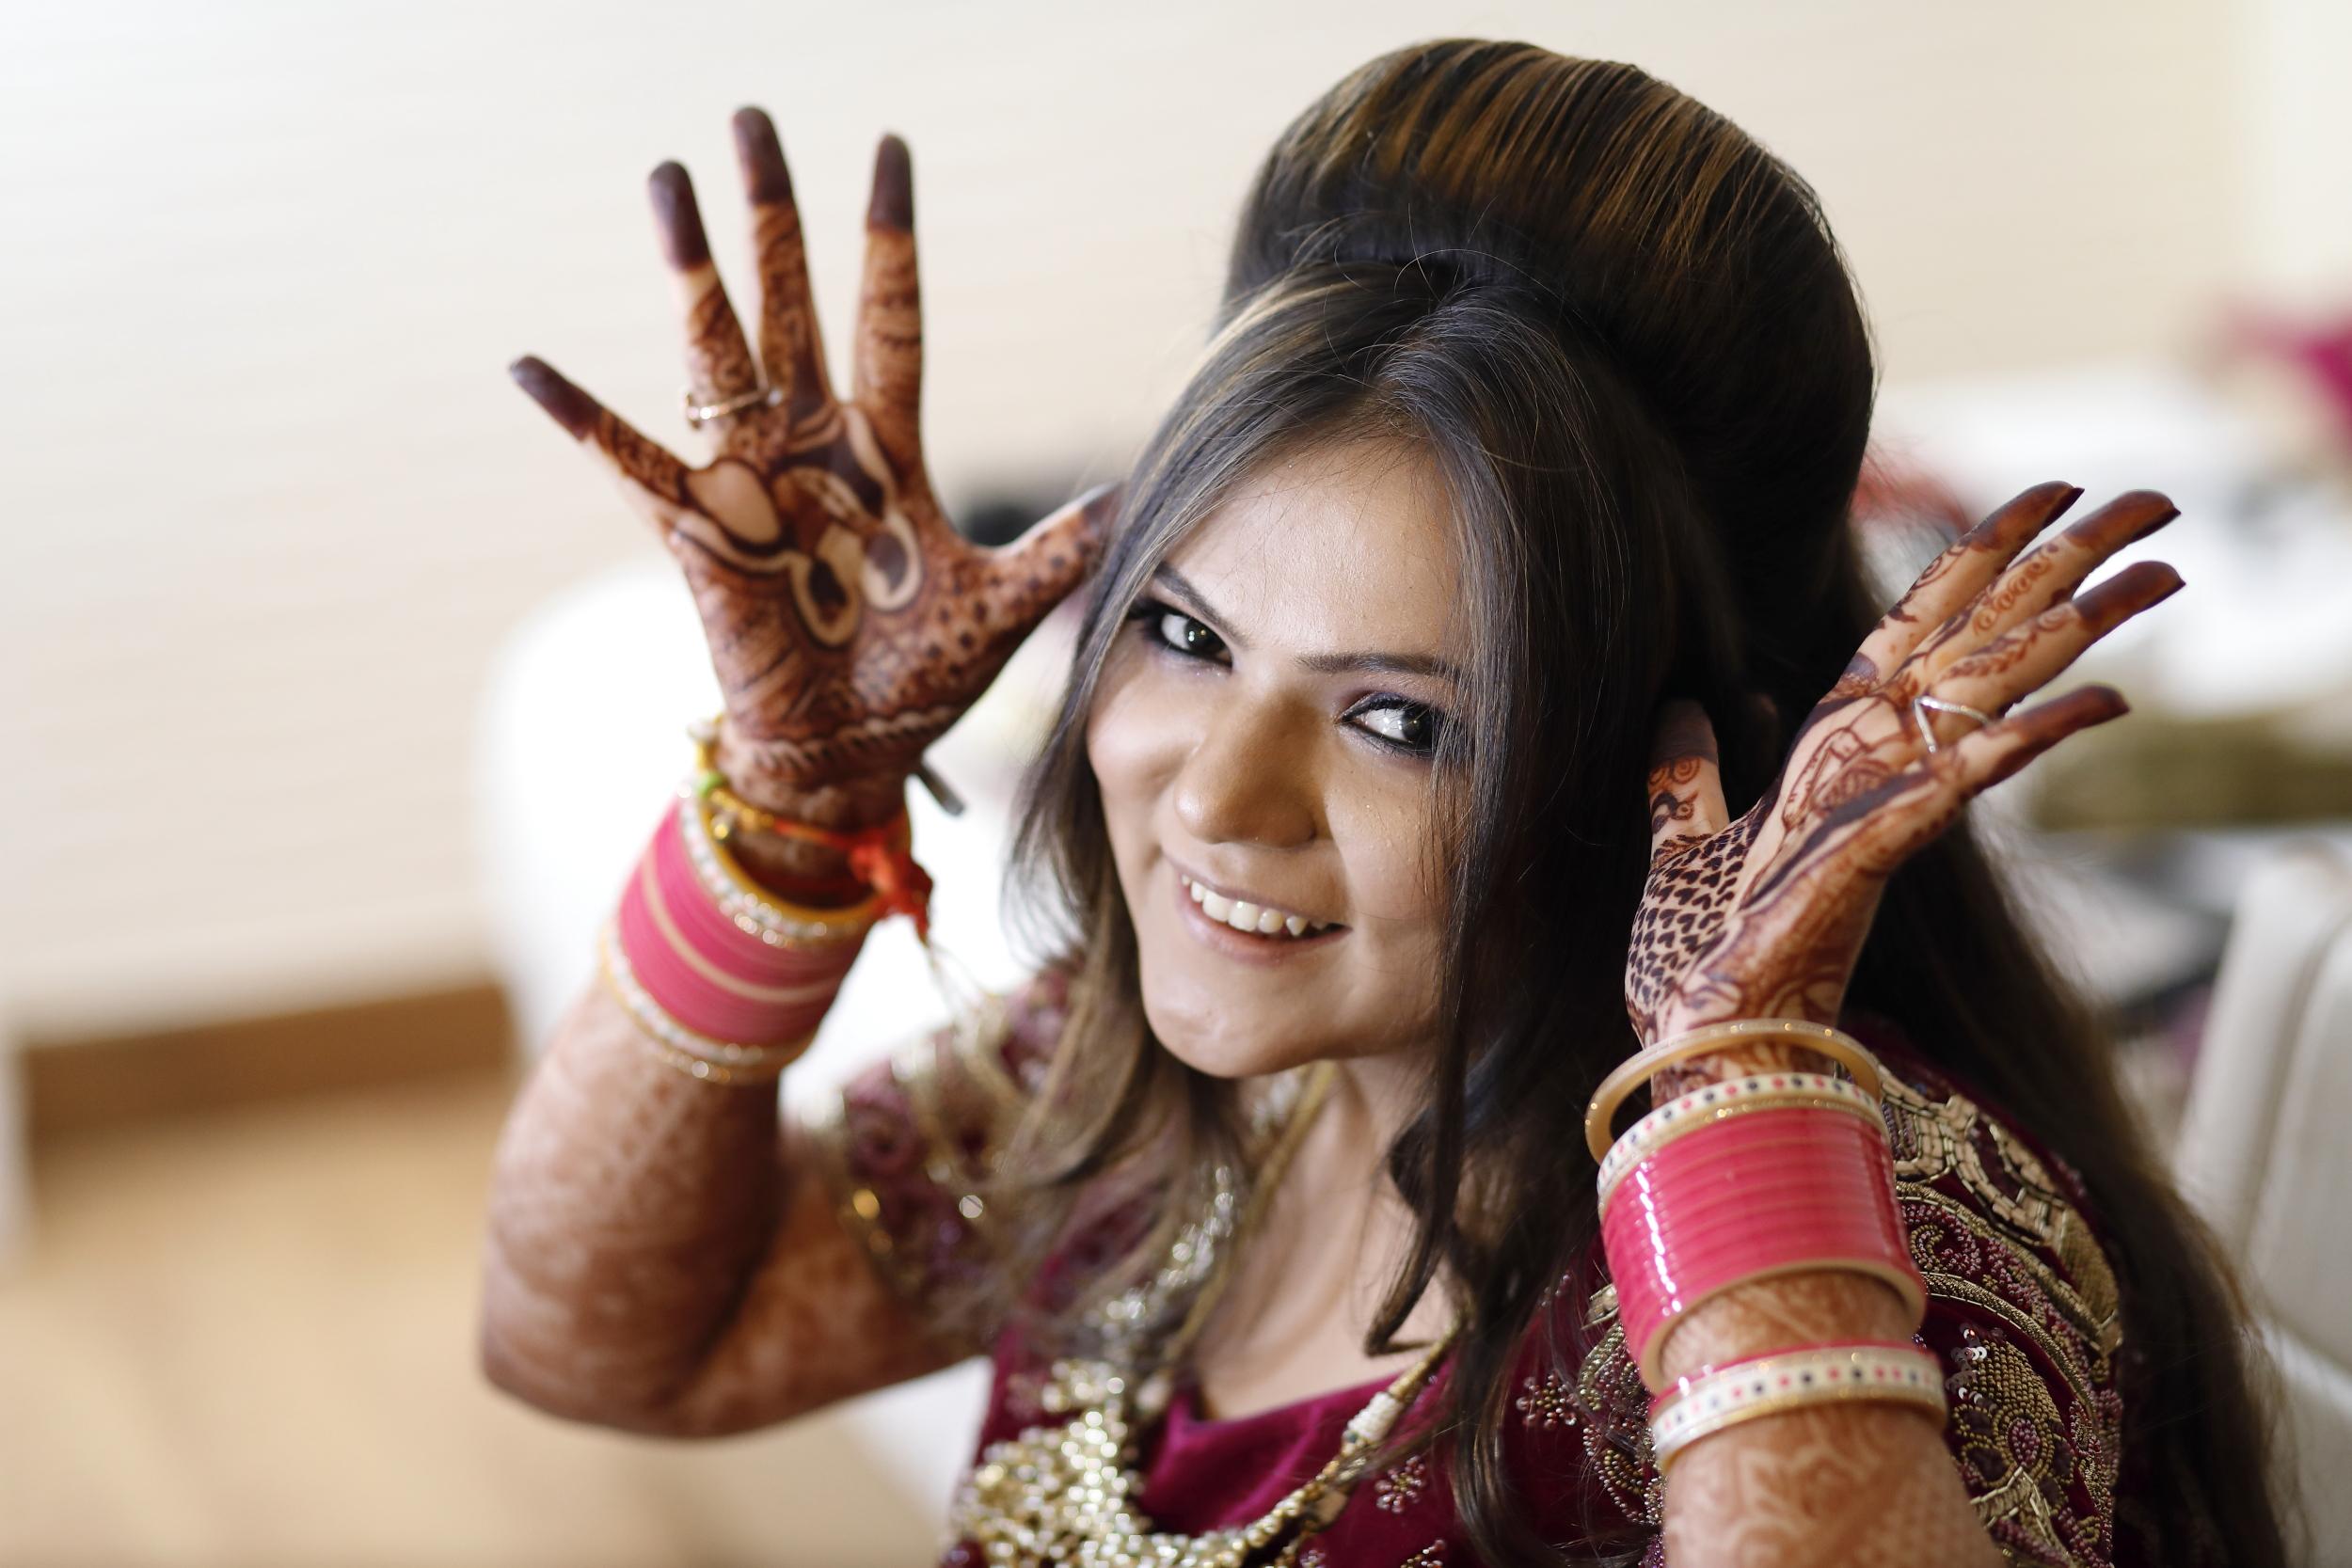 Candid wedding photographersC69A0515 Delhi